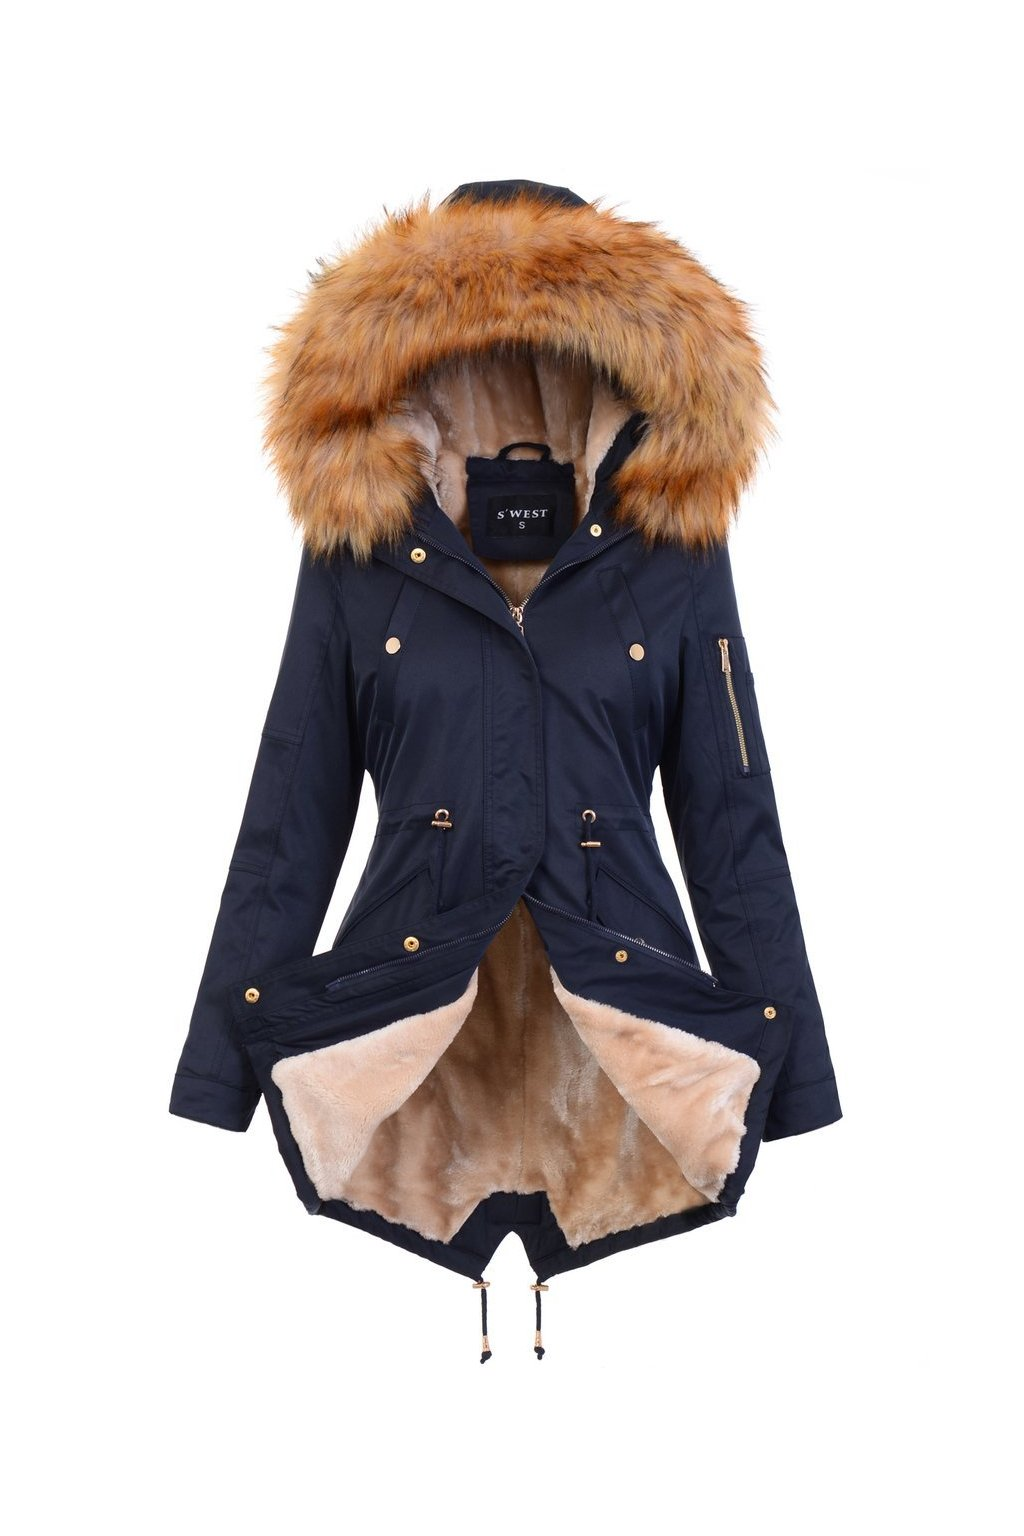 Dámska zimná bunda parka s kožušinou 4881 modrá